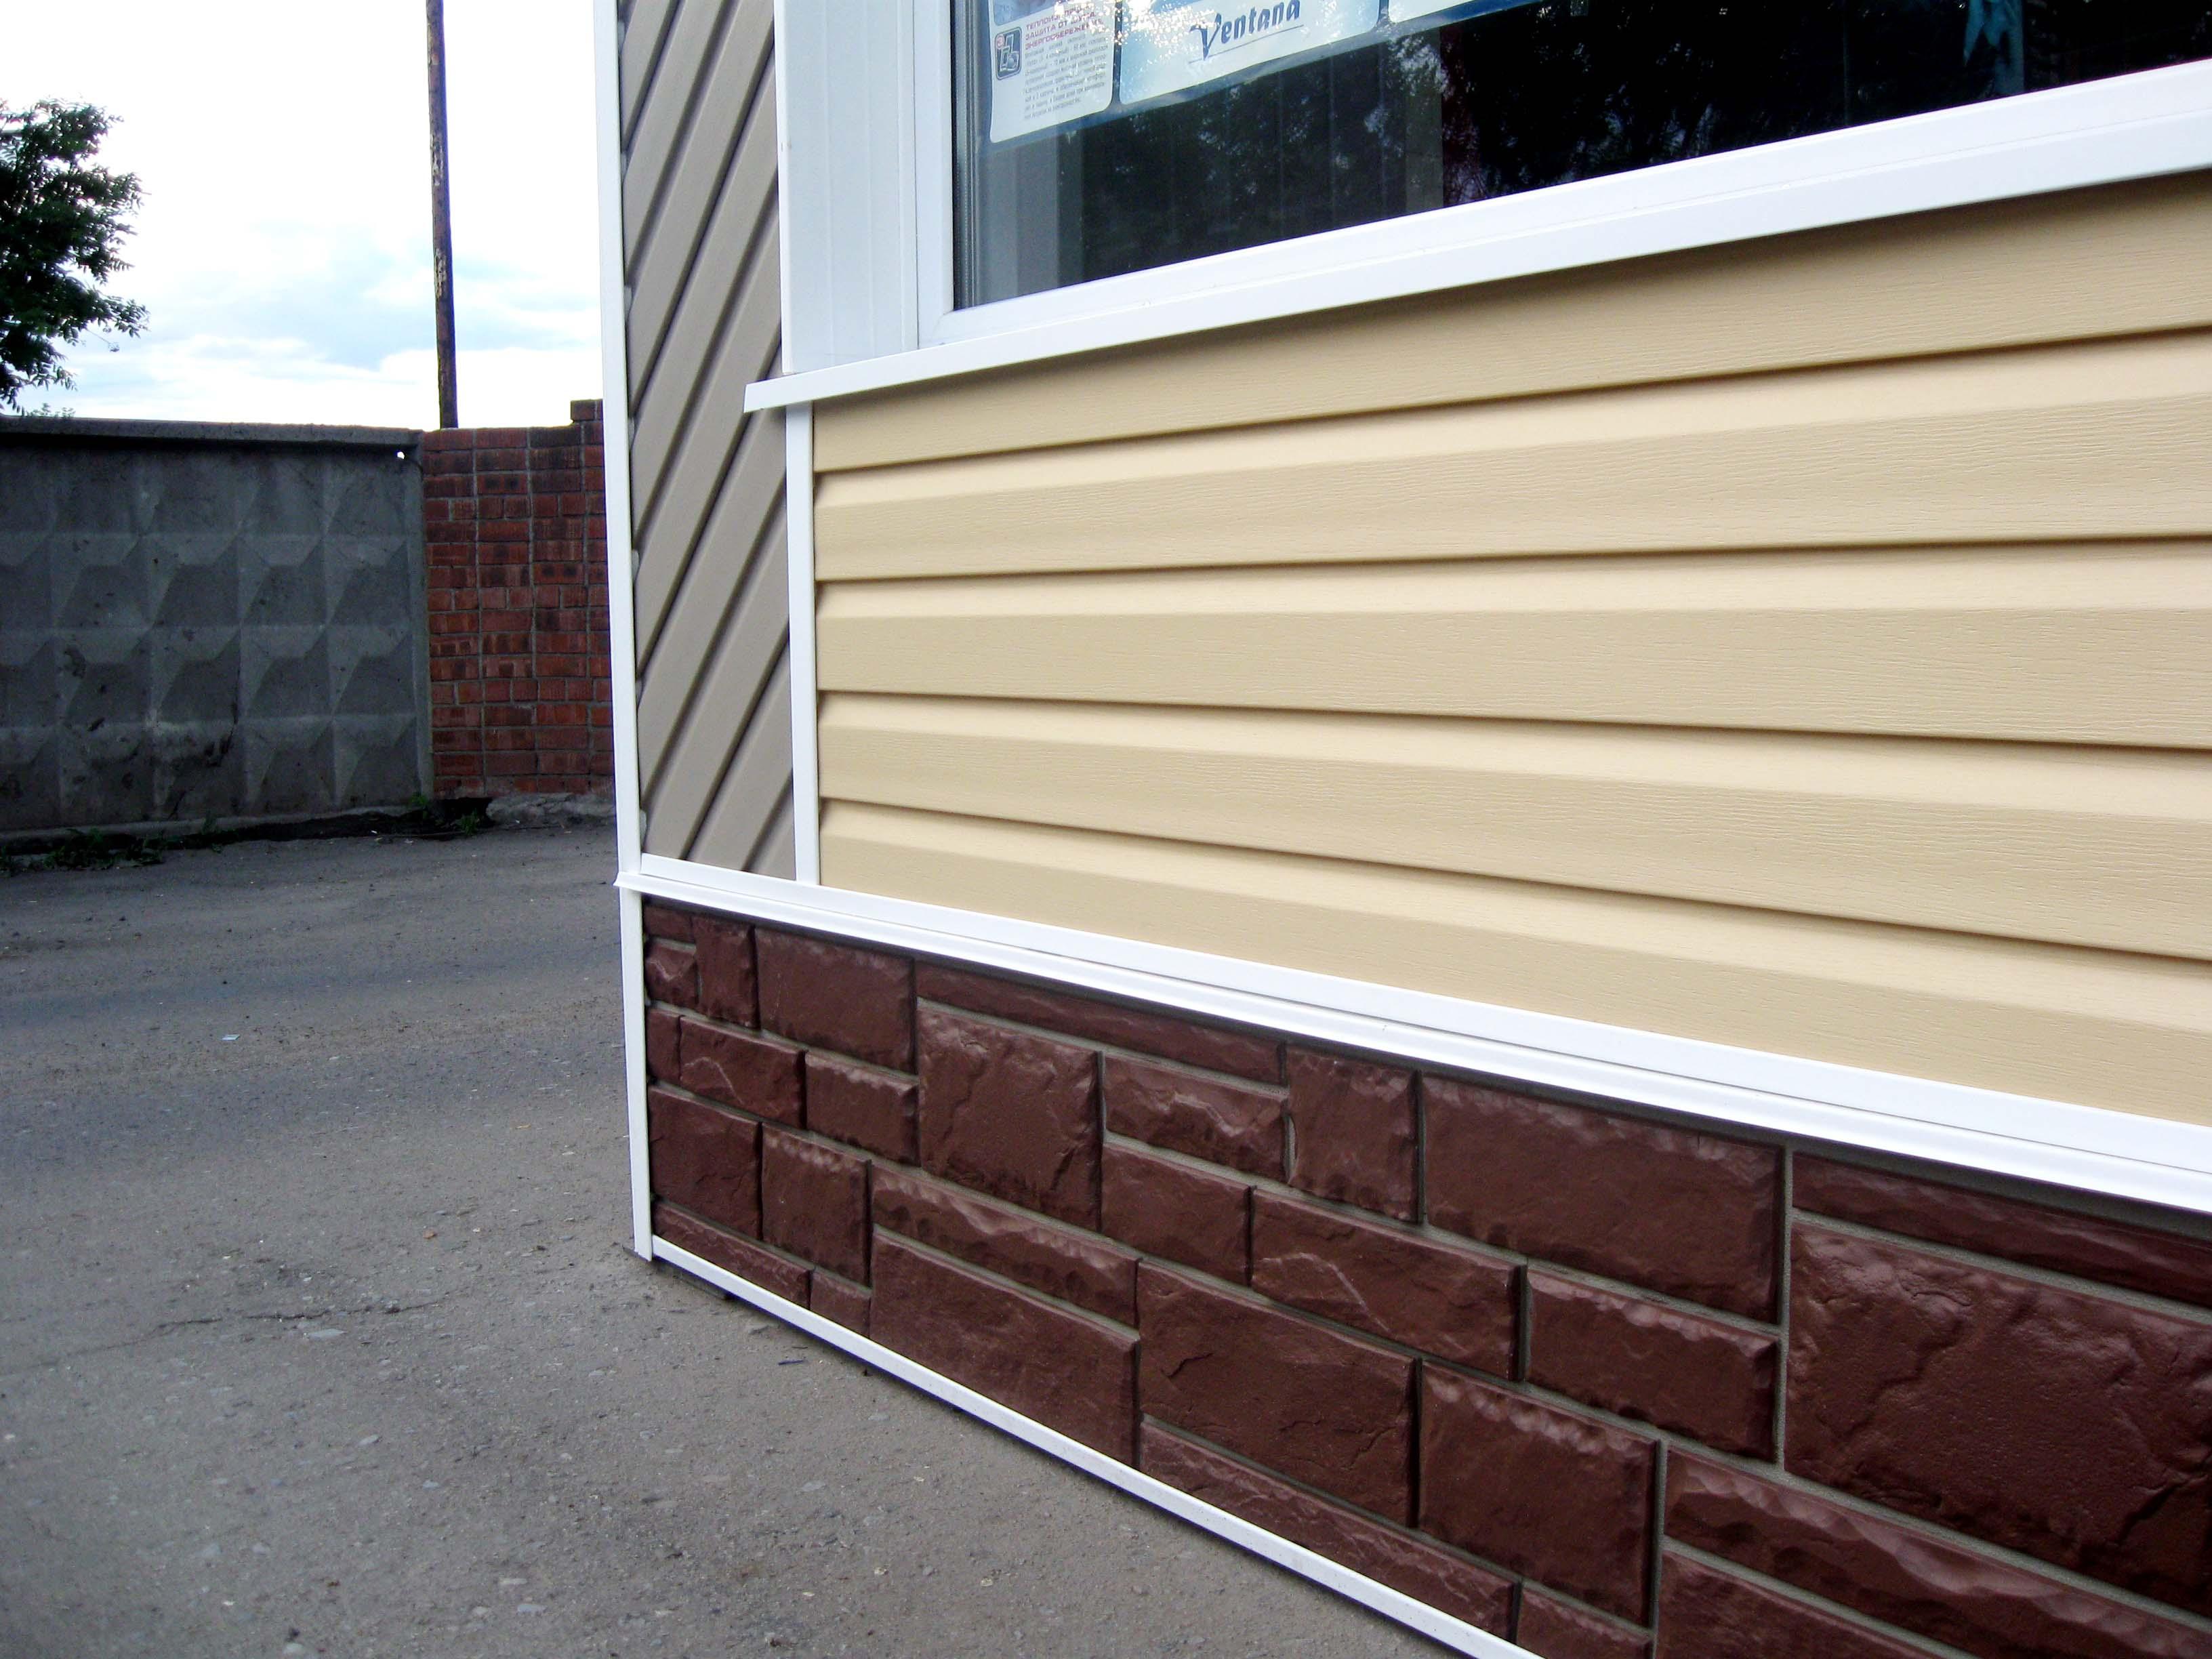 Pannelli seminterrati (57 foto): materiali per pareti ...